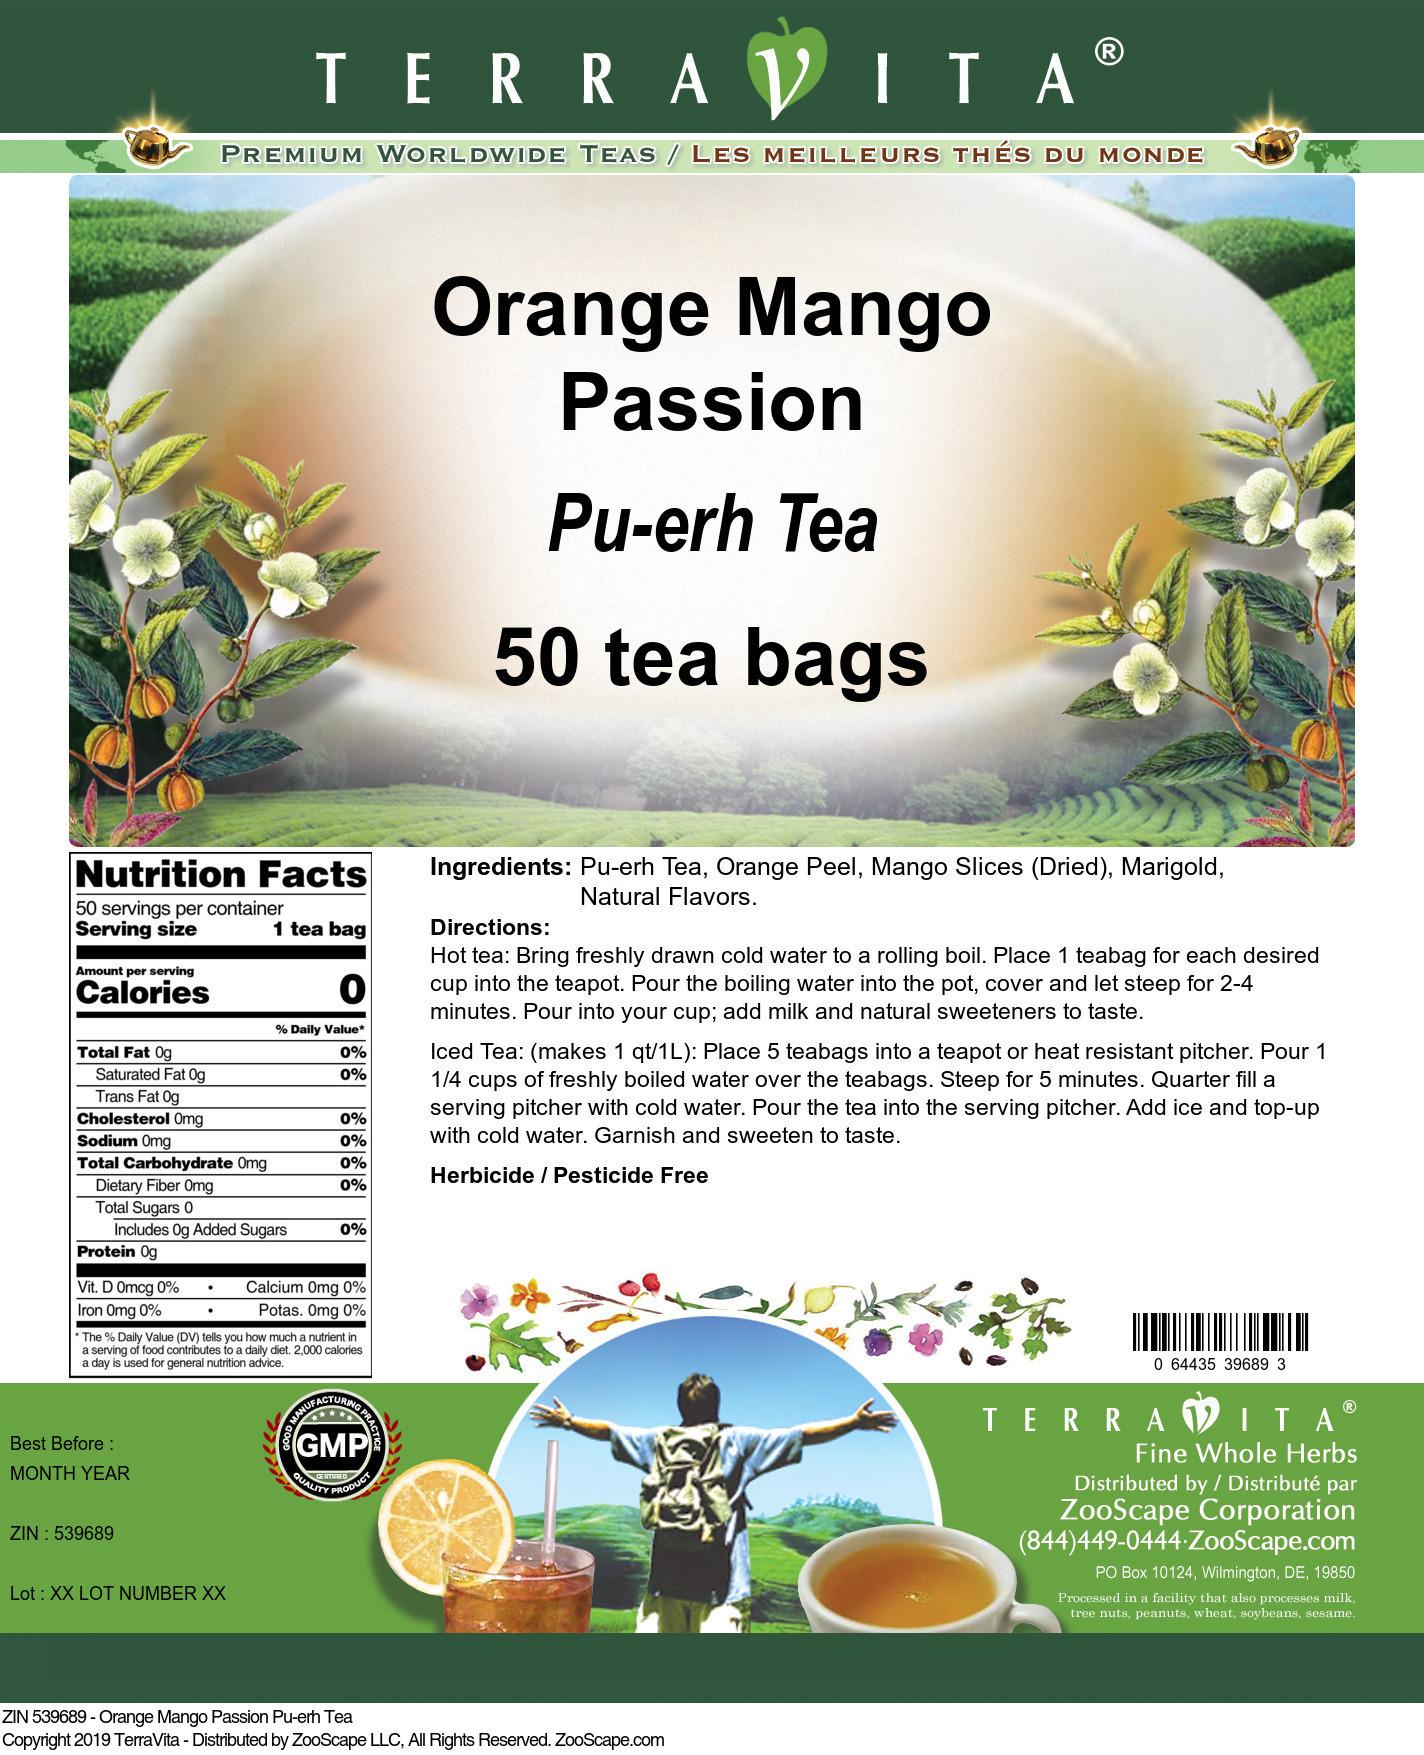 Orange Mango Passion Pu-erh Tea